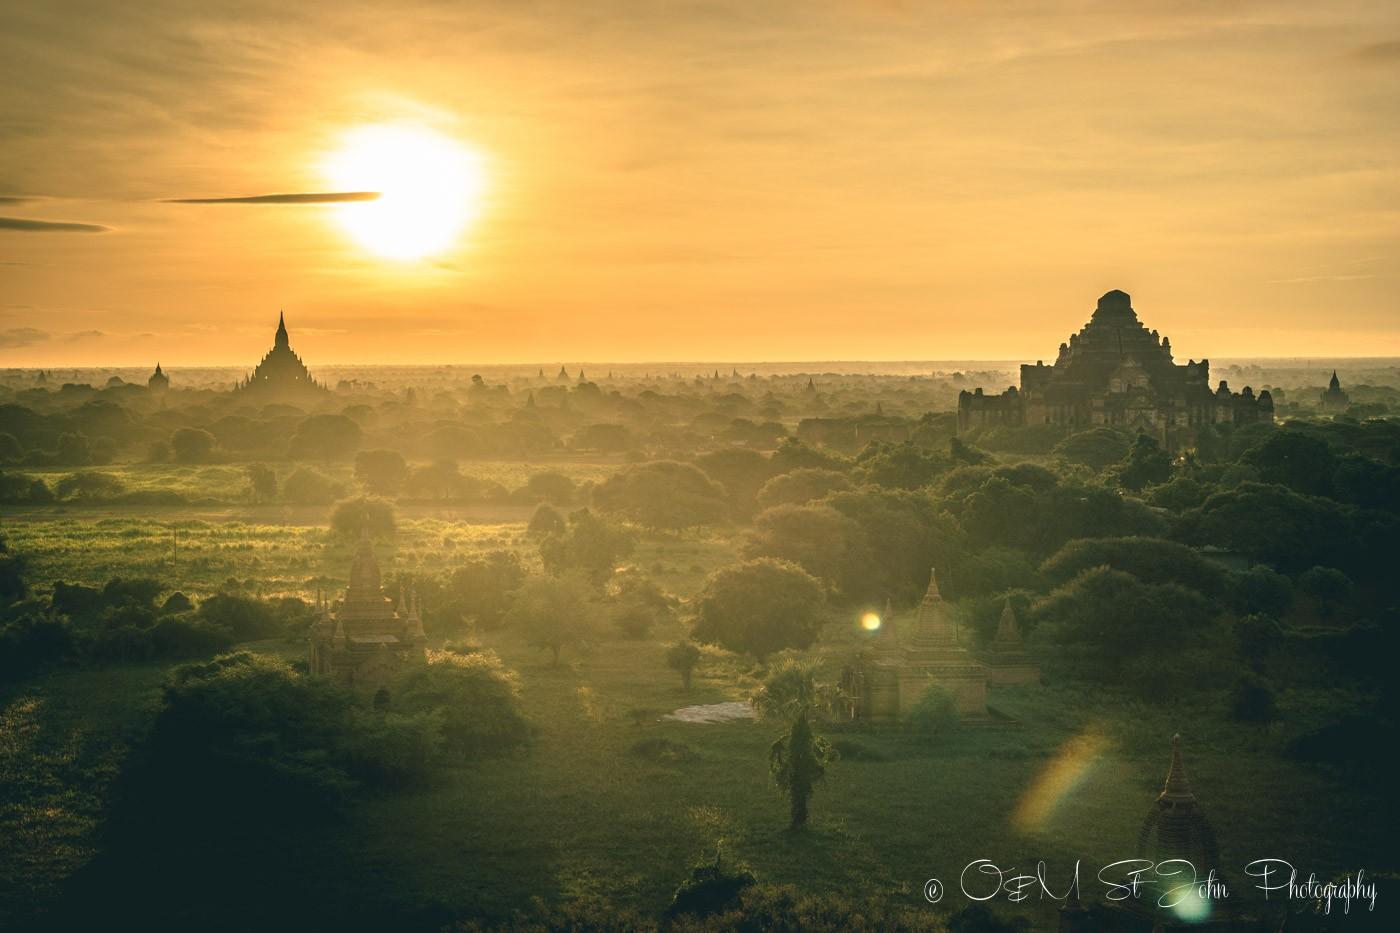 Myanmar travel: Sunset over Bagan, Myanmar